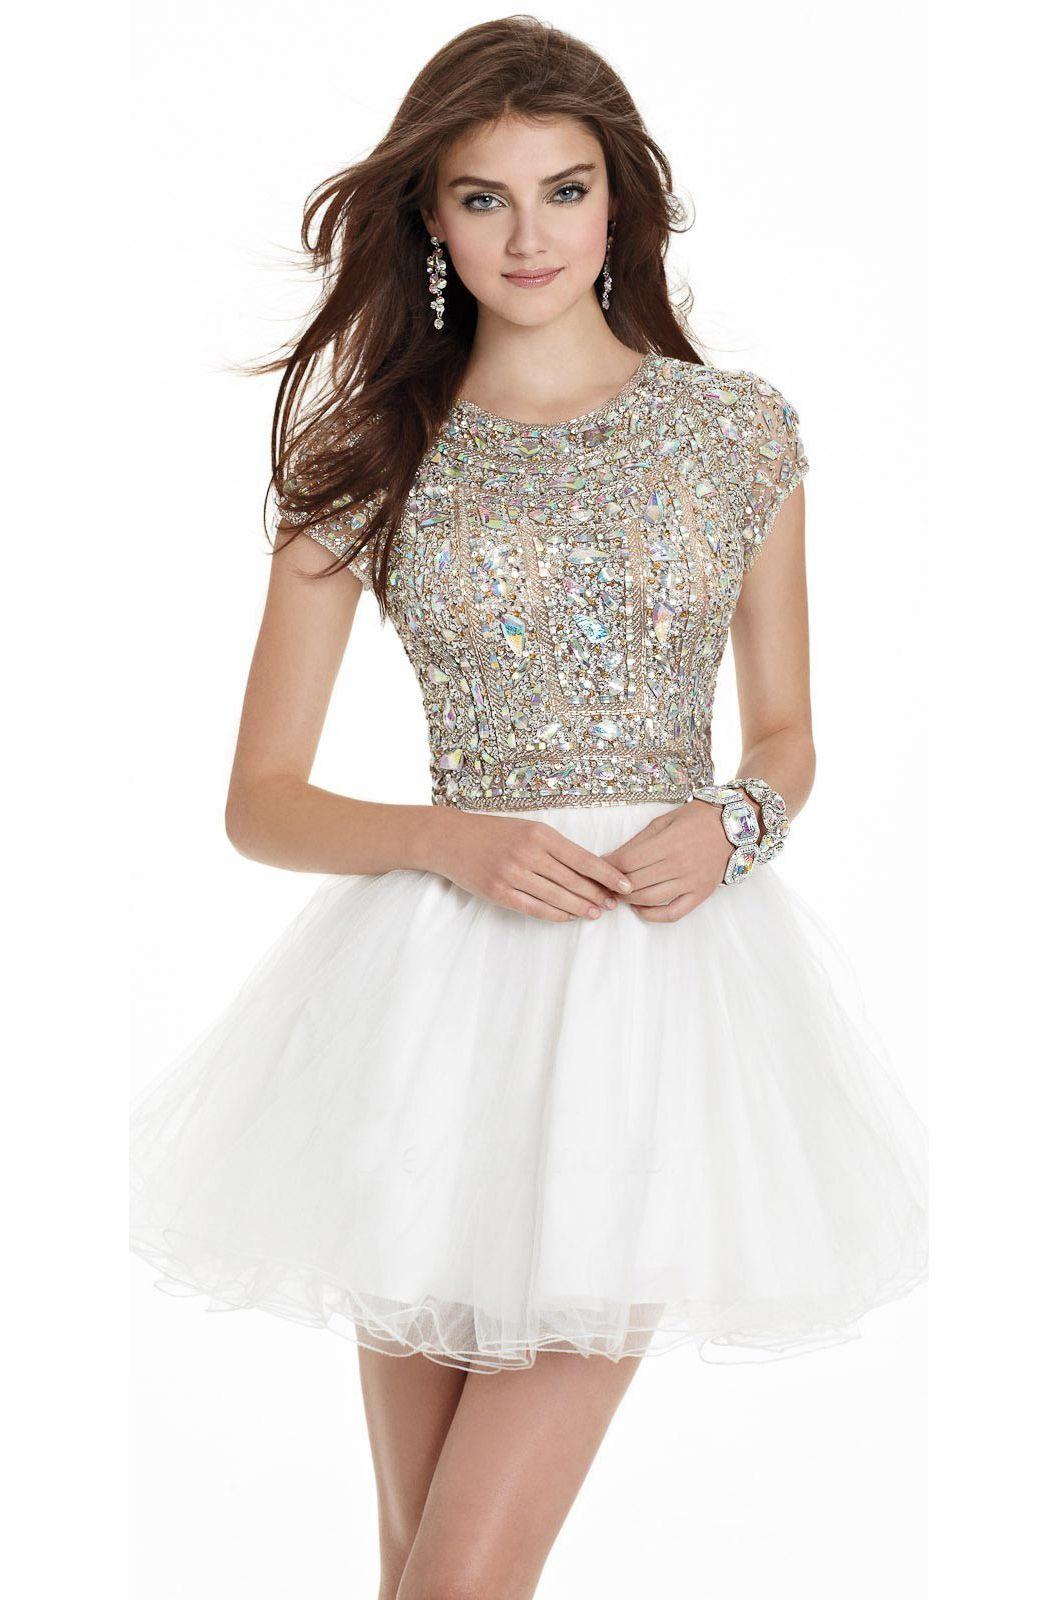 5d74ca9bb2 Beaded Short Sleeve Tulle Prom Dress- Findress.com